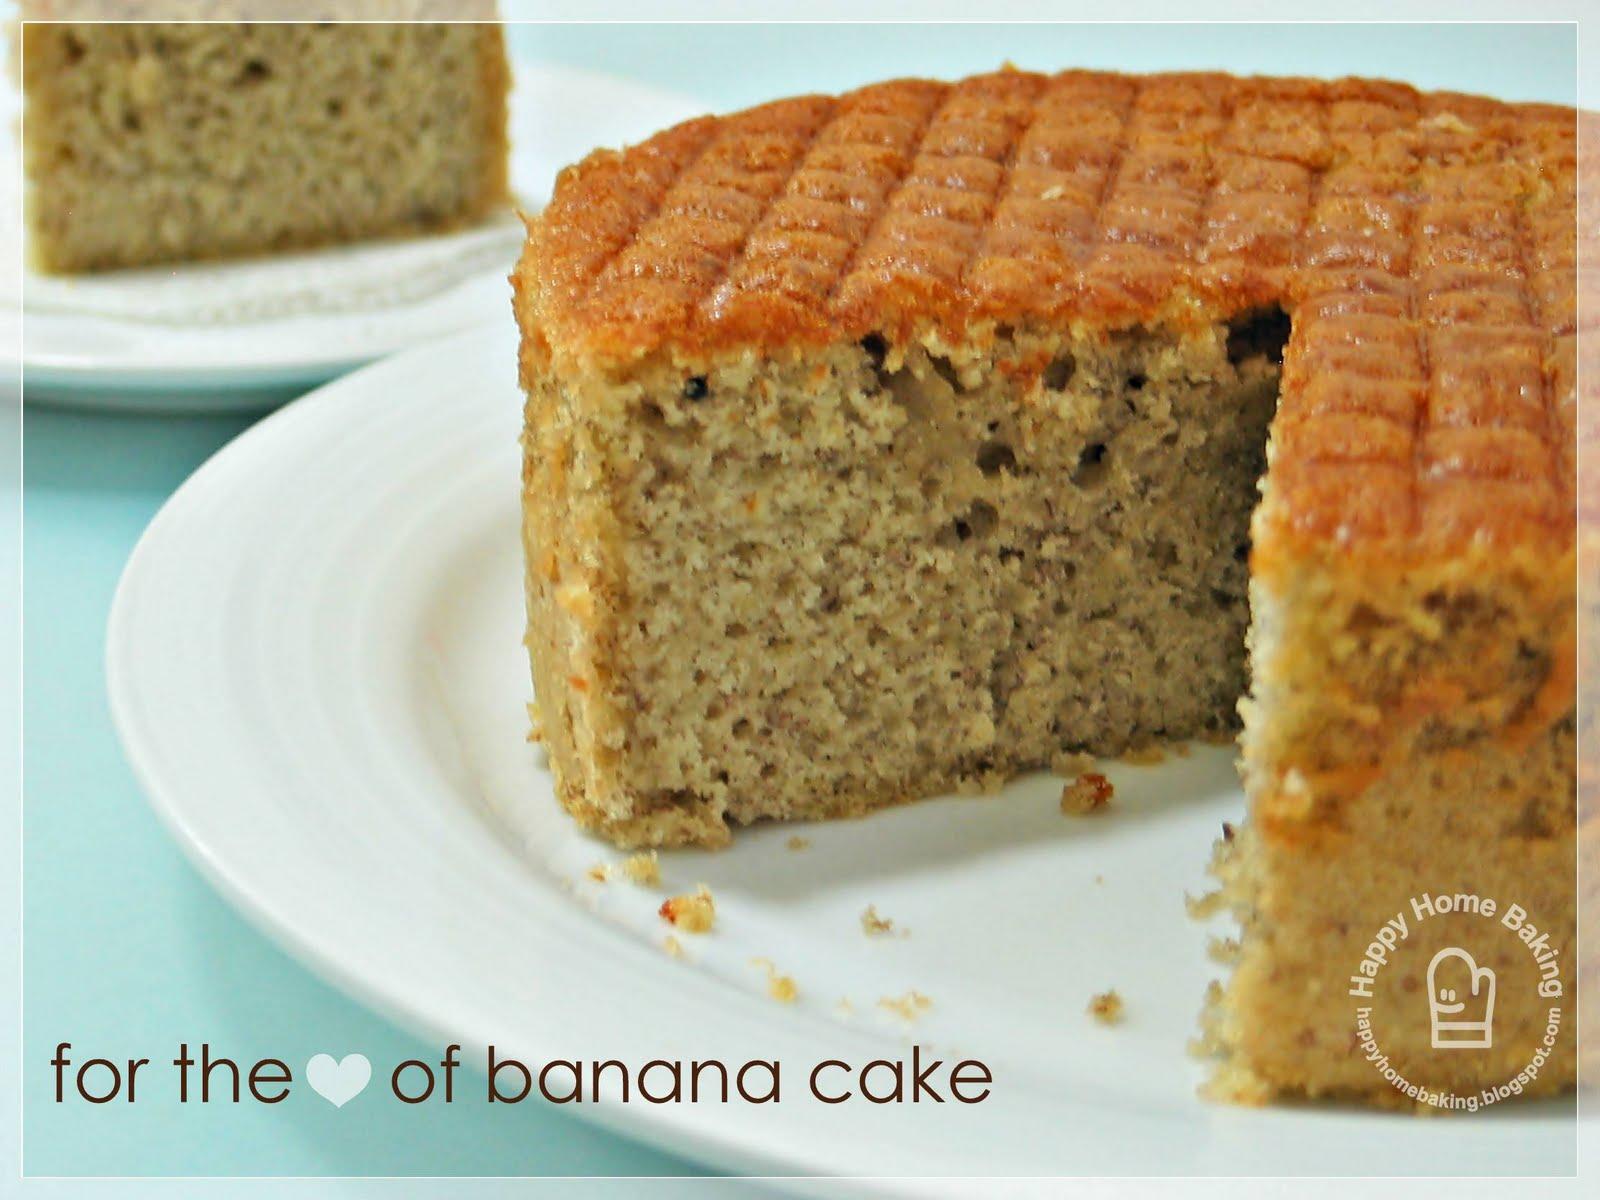 Banana cake nz recipe